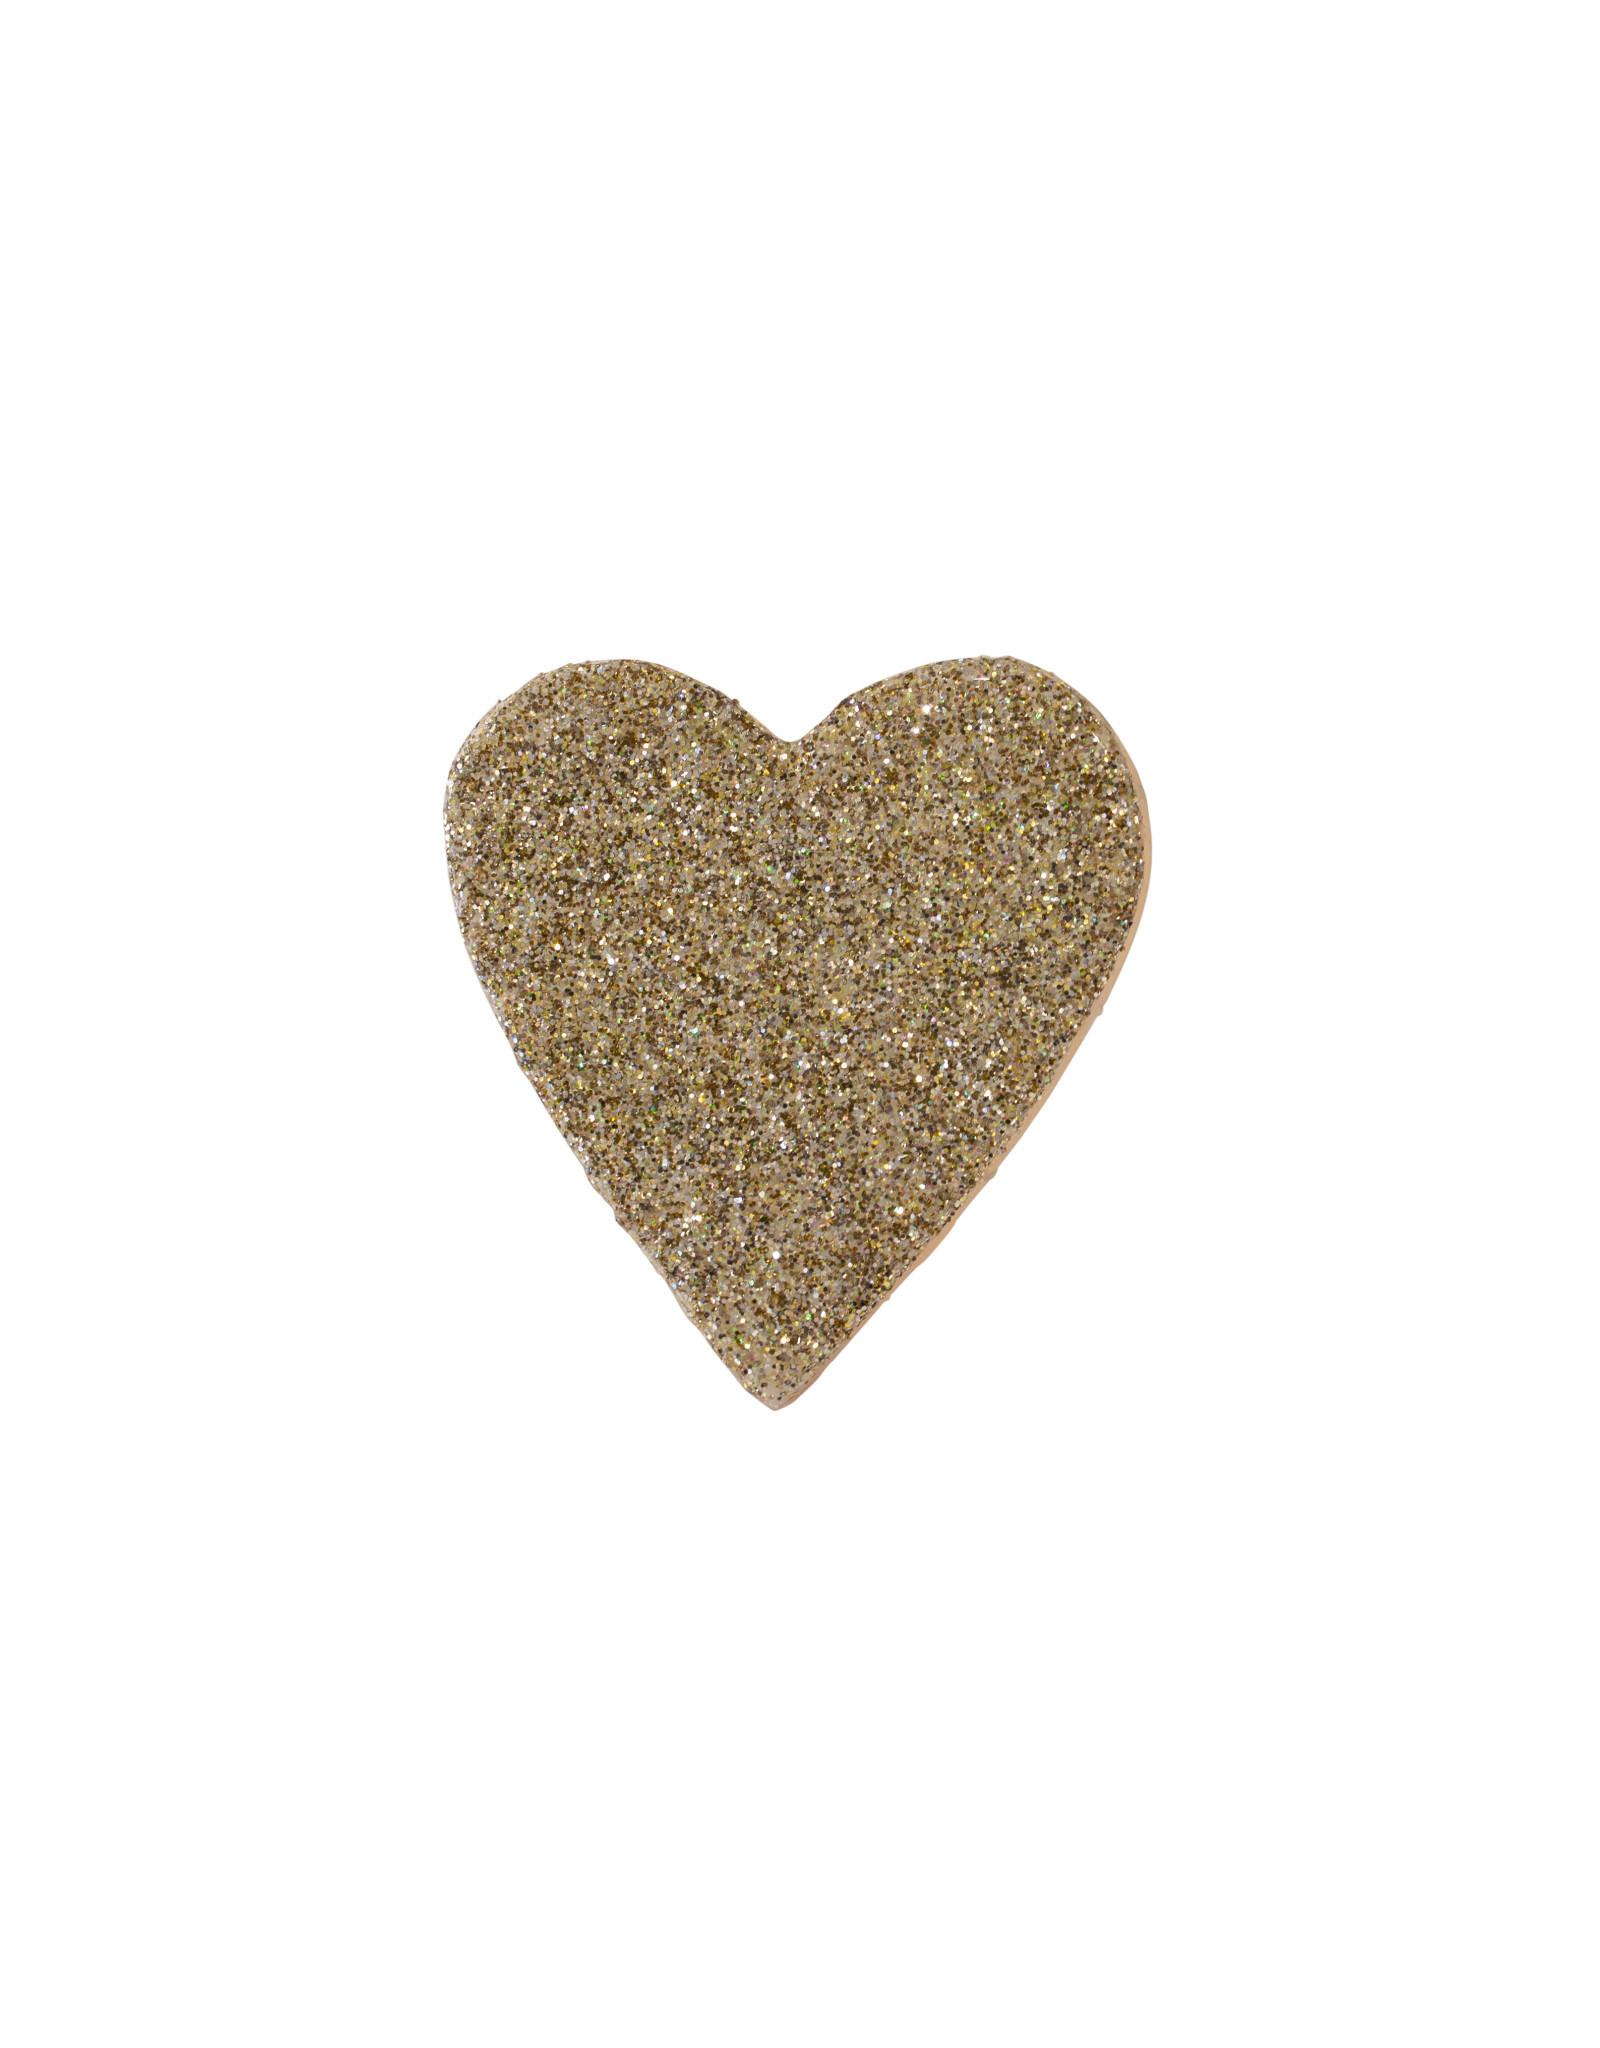 Entouquet Champagne Glitter Small Heart